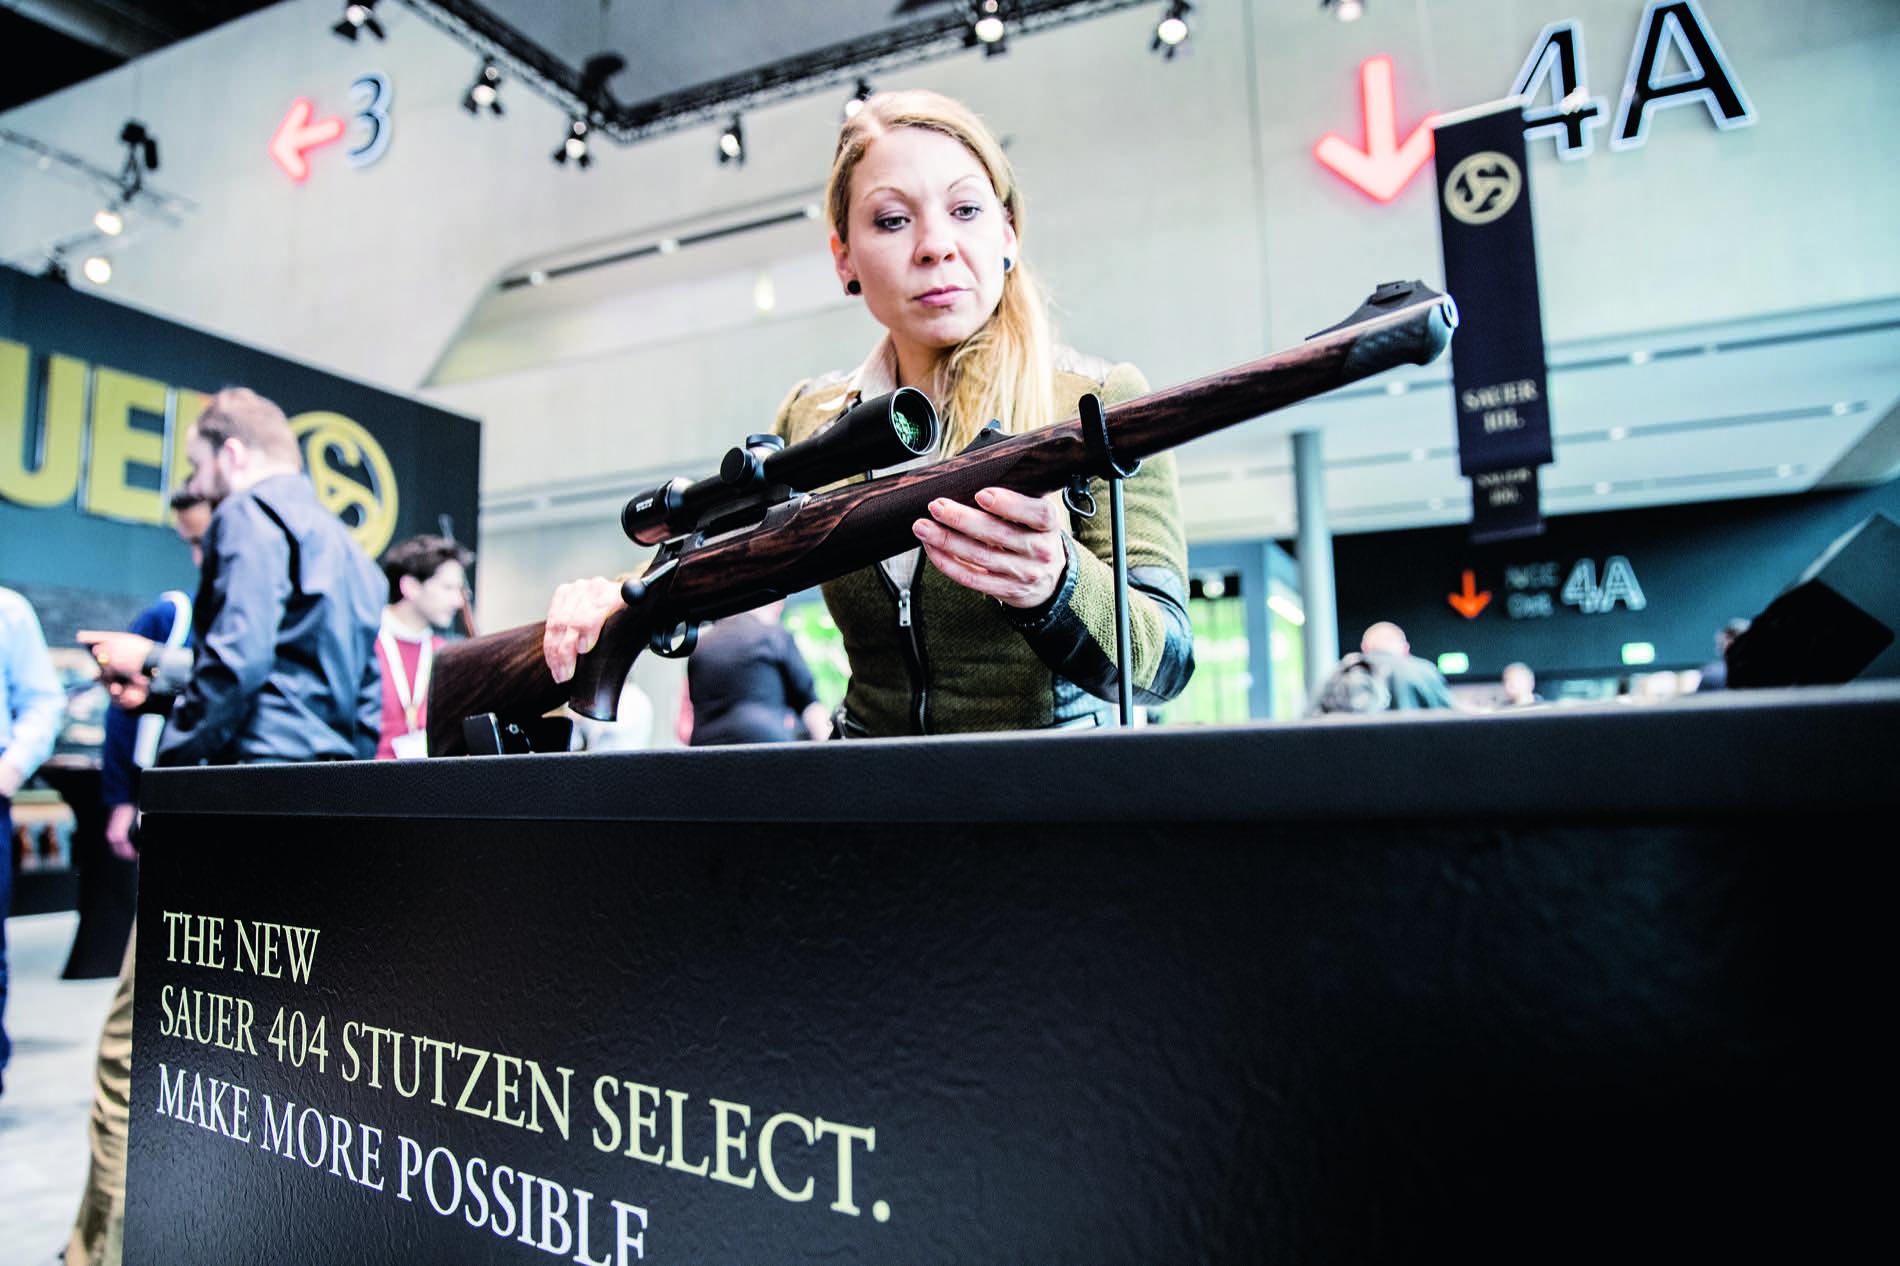 IWA 2017 Highlights Waffen Munition Fernglas Optik Kleidung Bekleidung